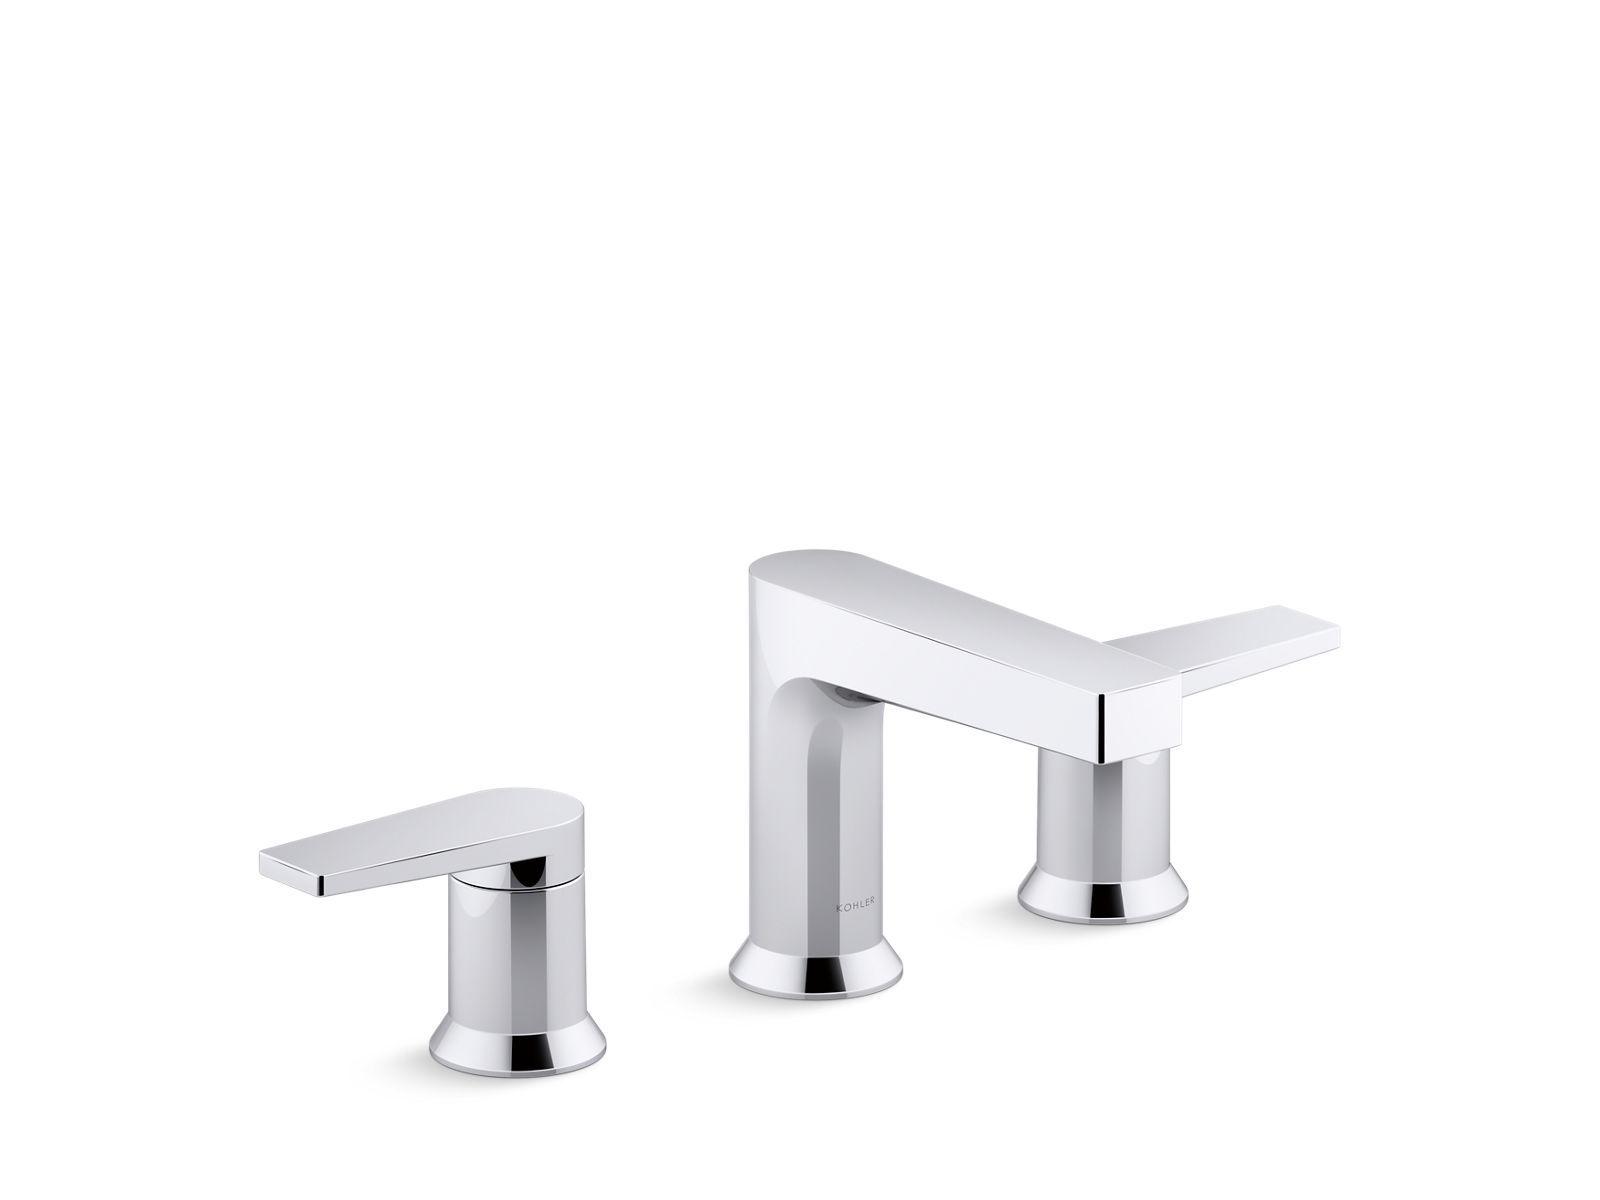 K 97100 4 Taut Widespread Faucet Kohler Sink Faucets Bathroom Sink Faucets Bathroom Sink